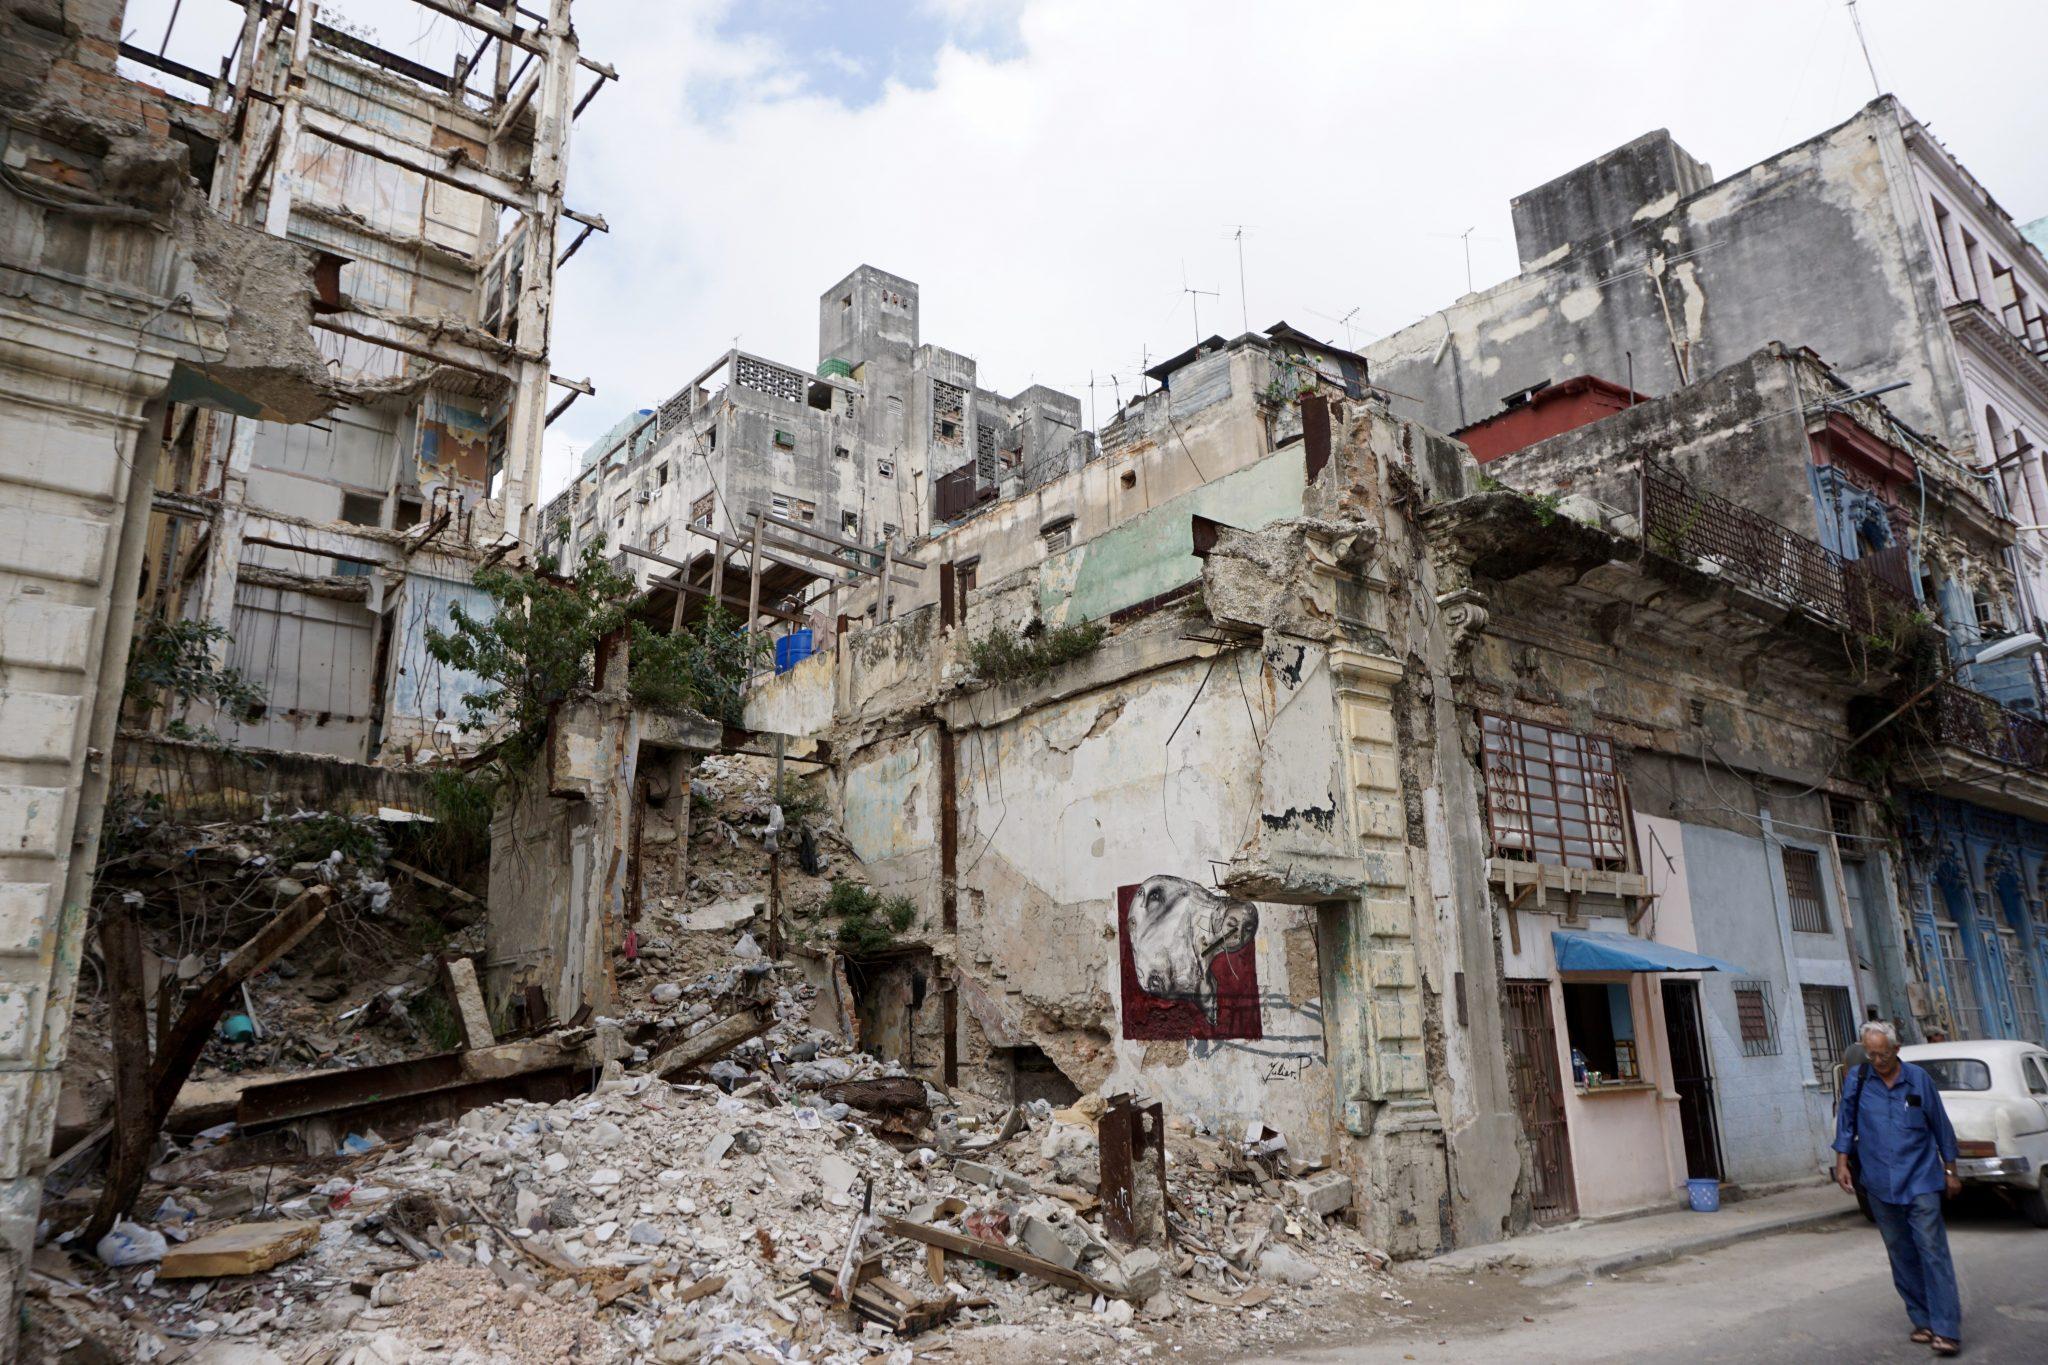 Havana, Cuba, collapsing building